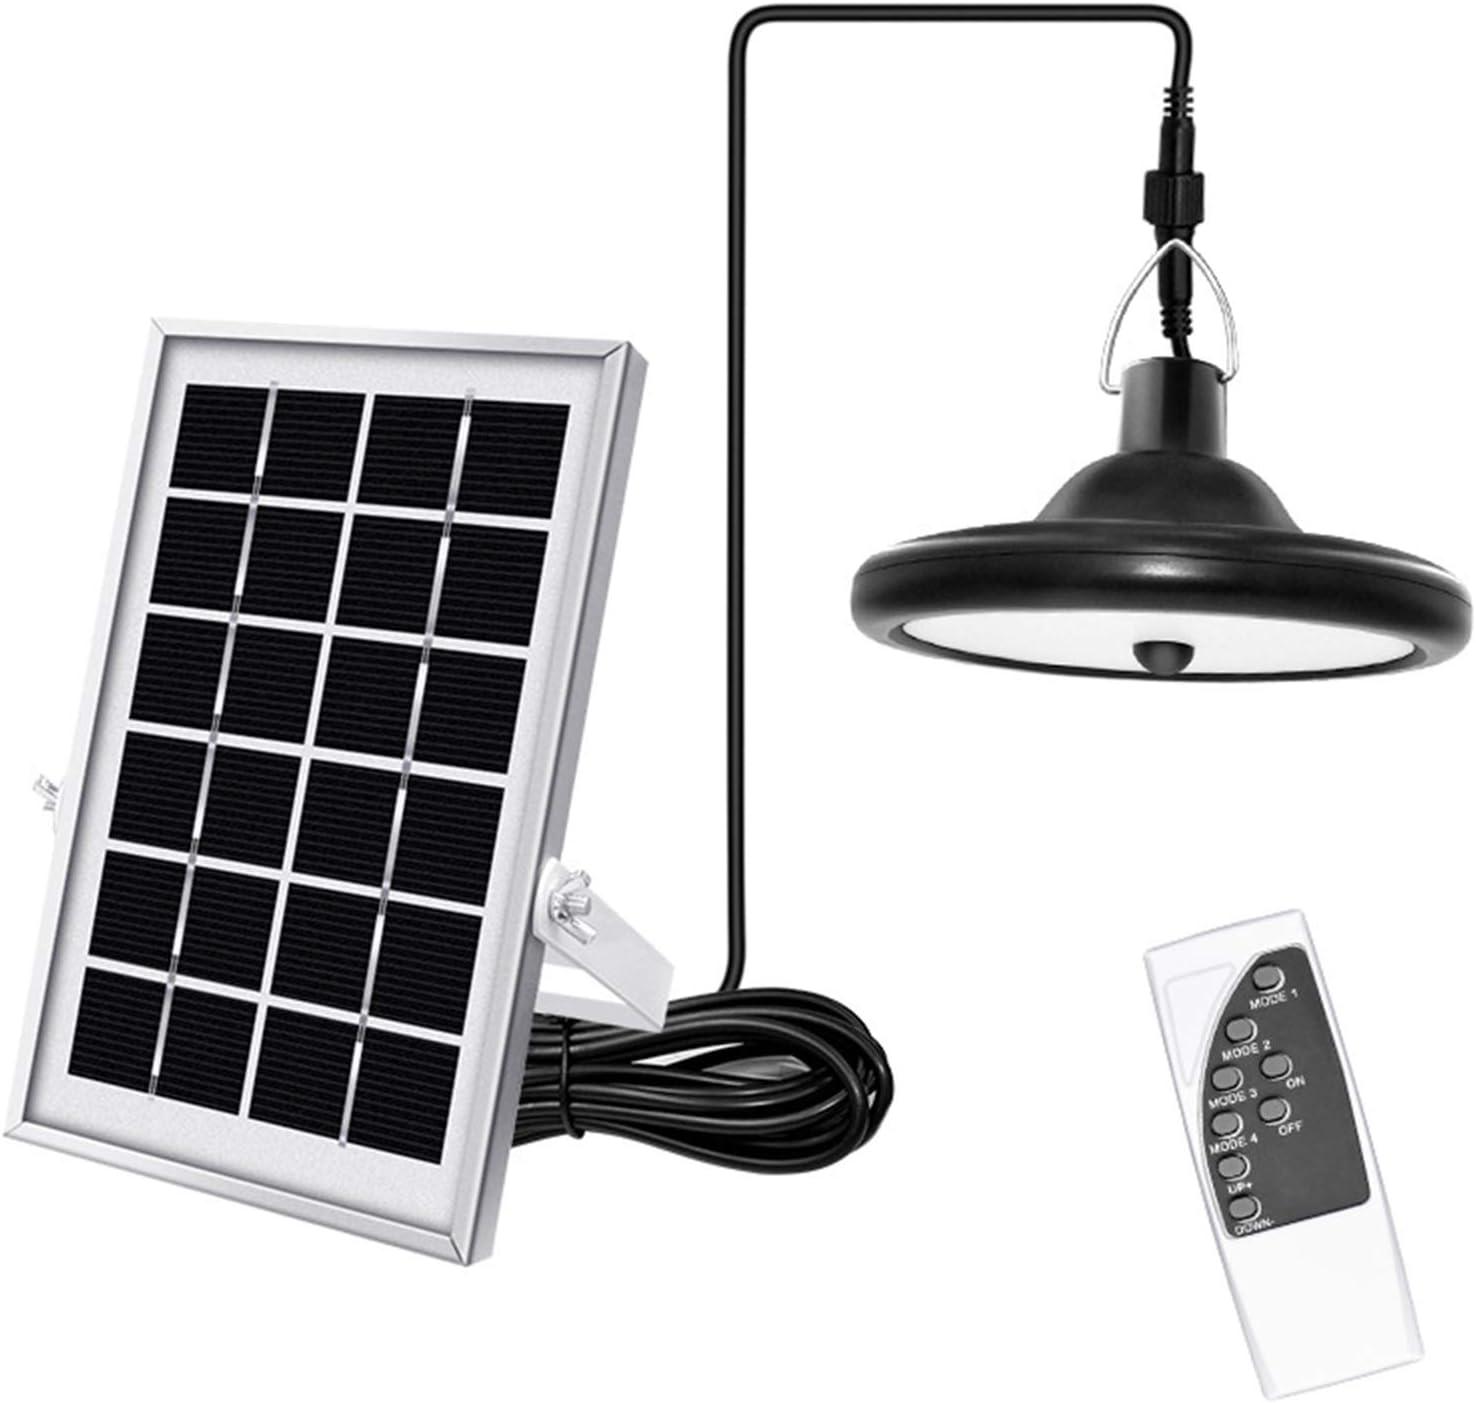 Upgraded Max 43% OFF Factory outlet Solar Pendant Light Motion Outdoor JACKYLED Sensor LED